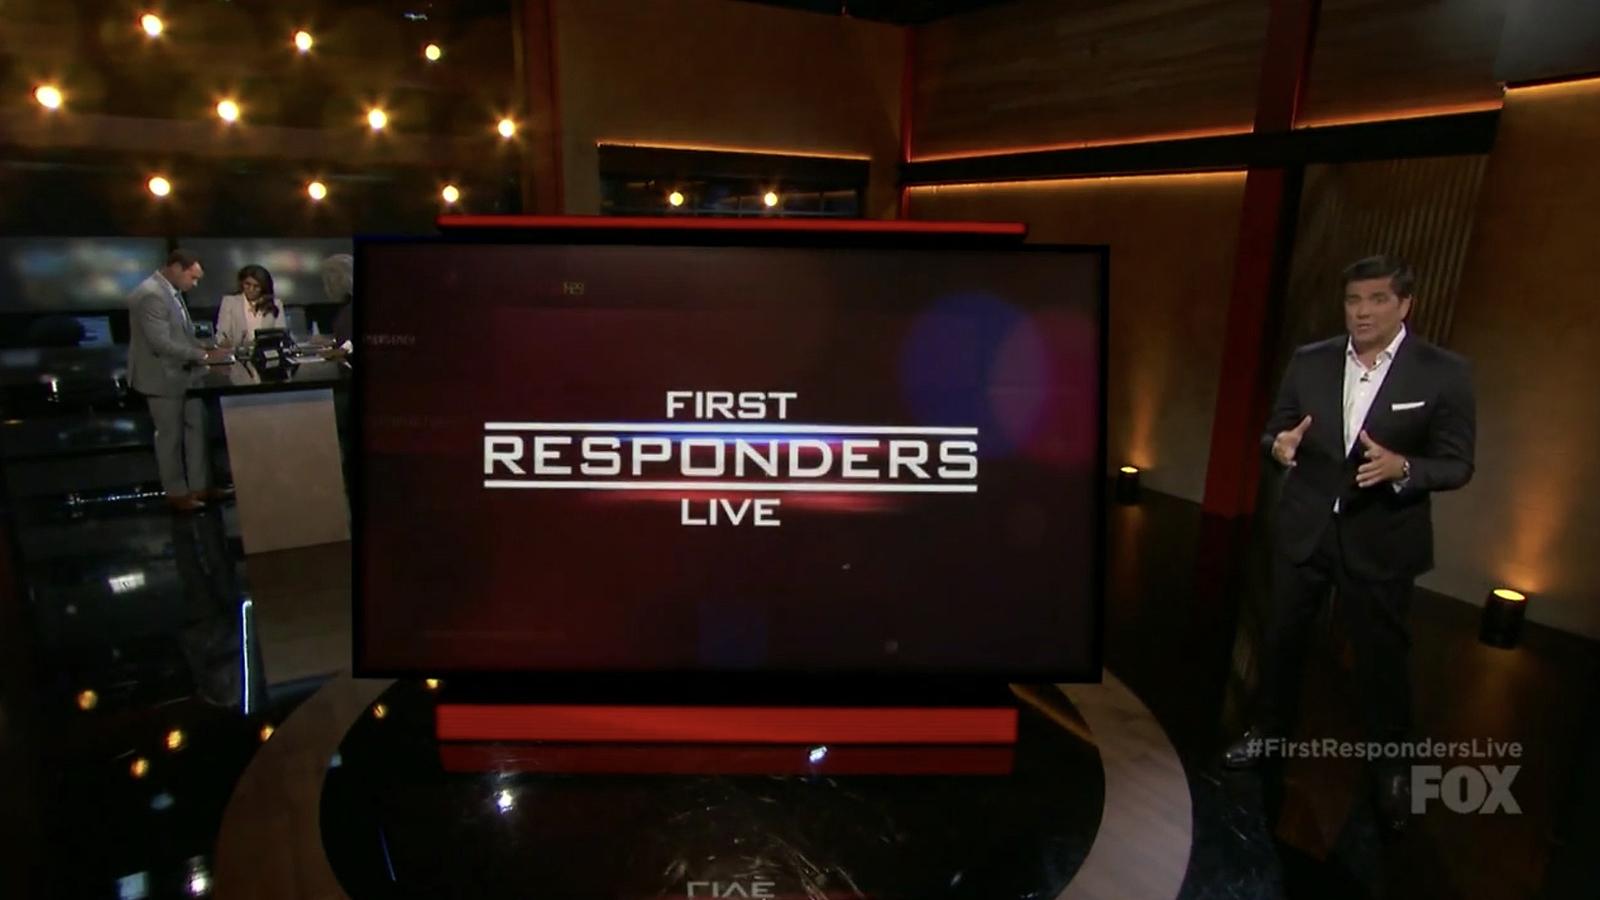 NCS_First-Responders-Live_Fox-AR-Set_0014